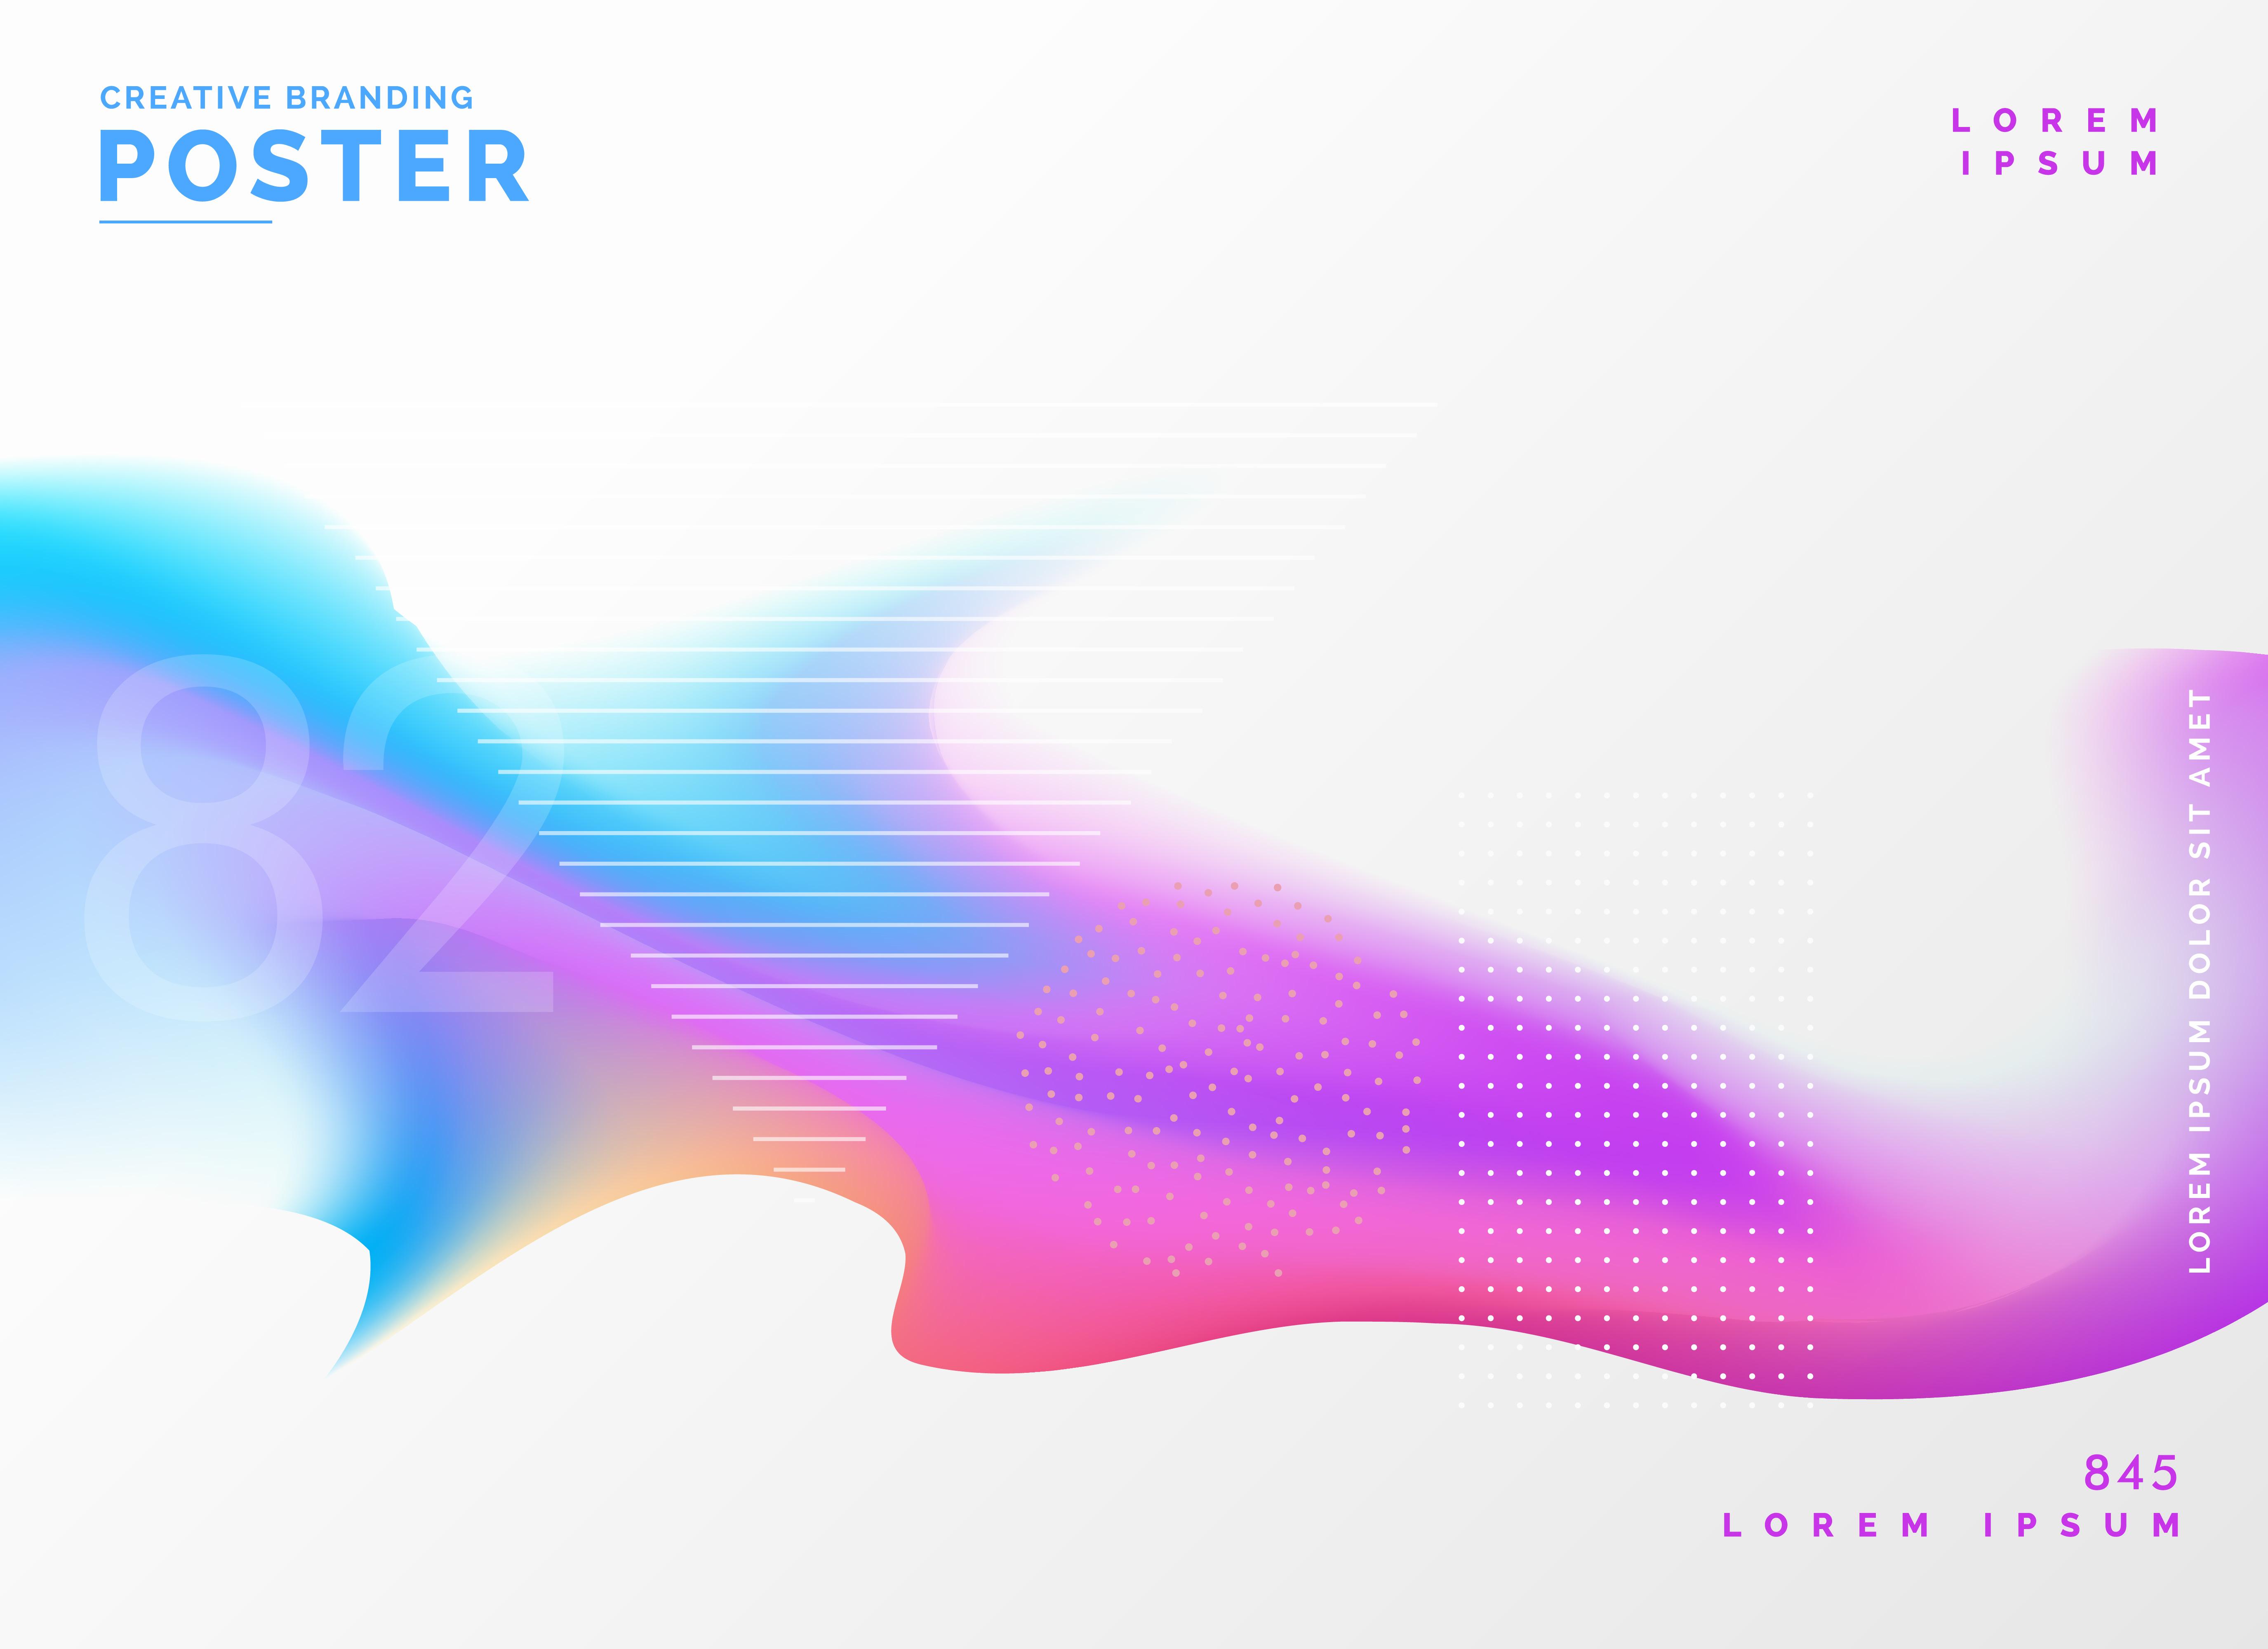 fluid color poster design template background